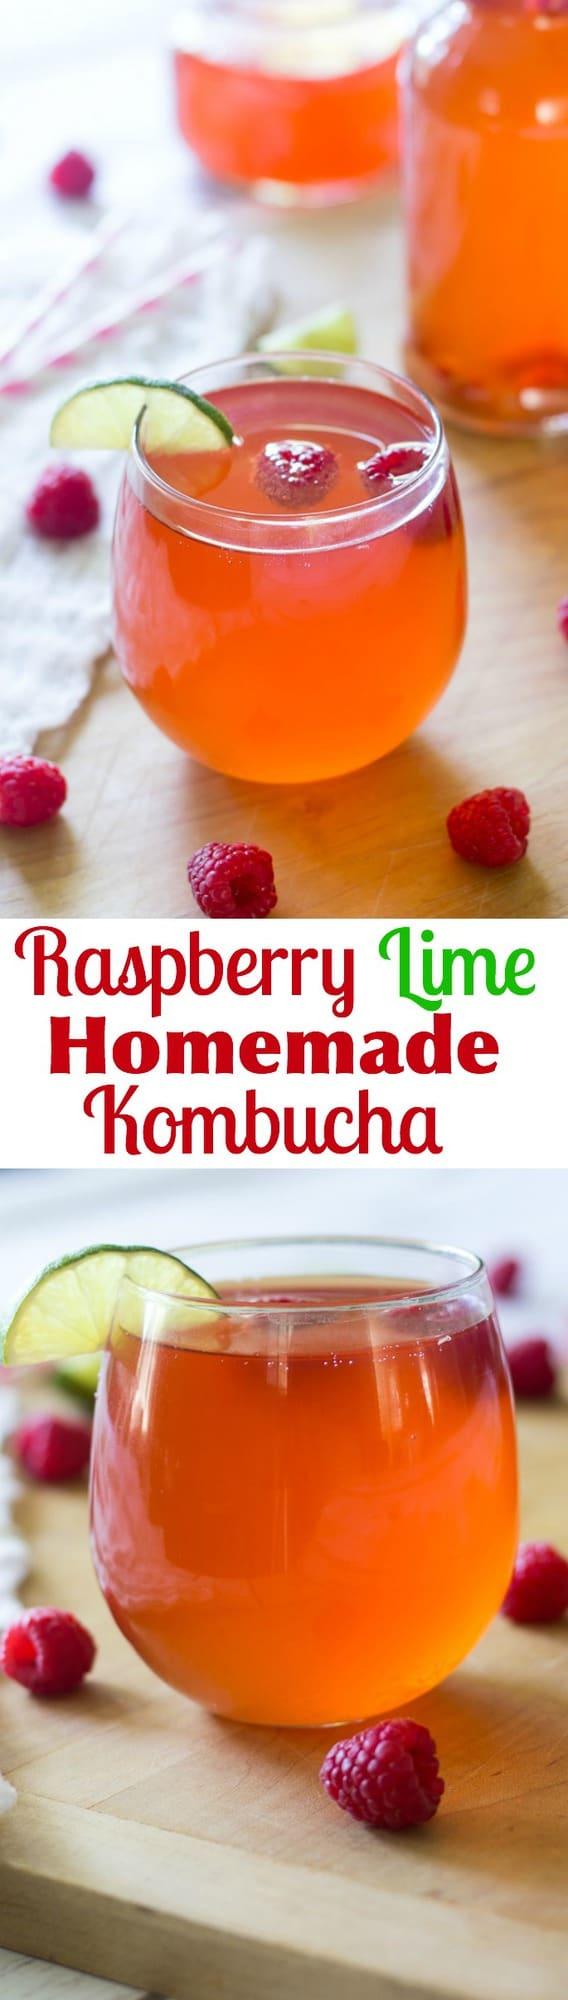 Raspberry Lime Homemade Kombucha